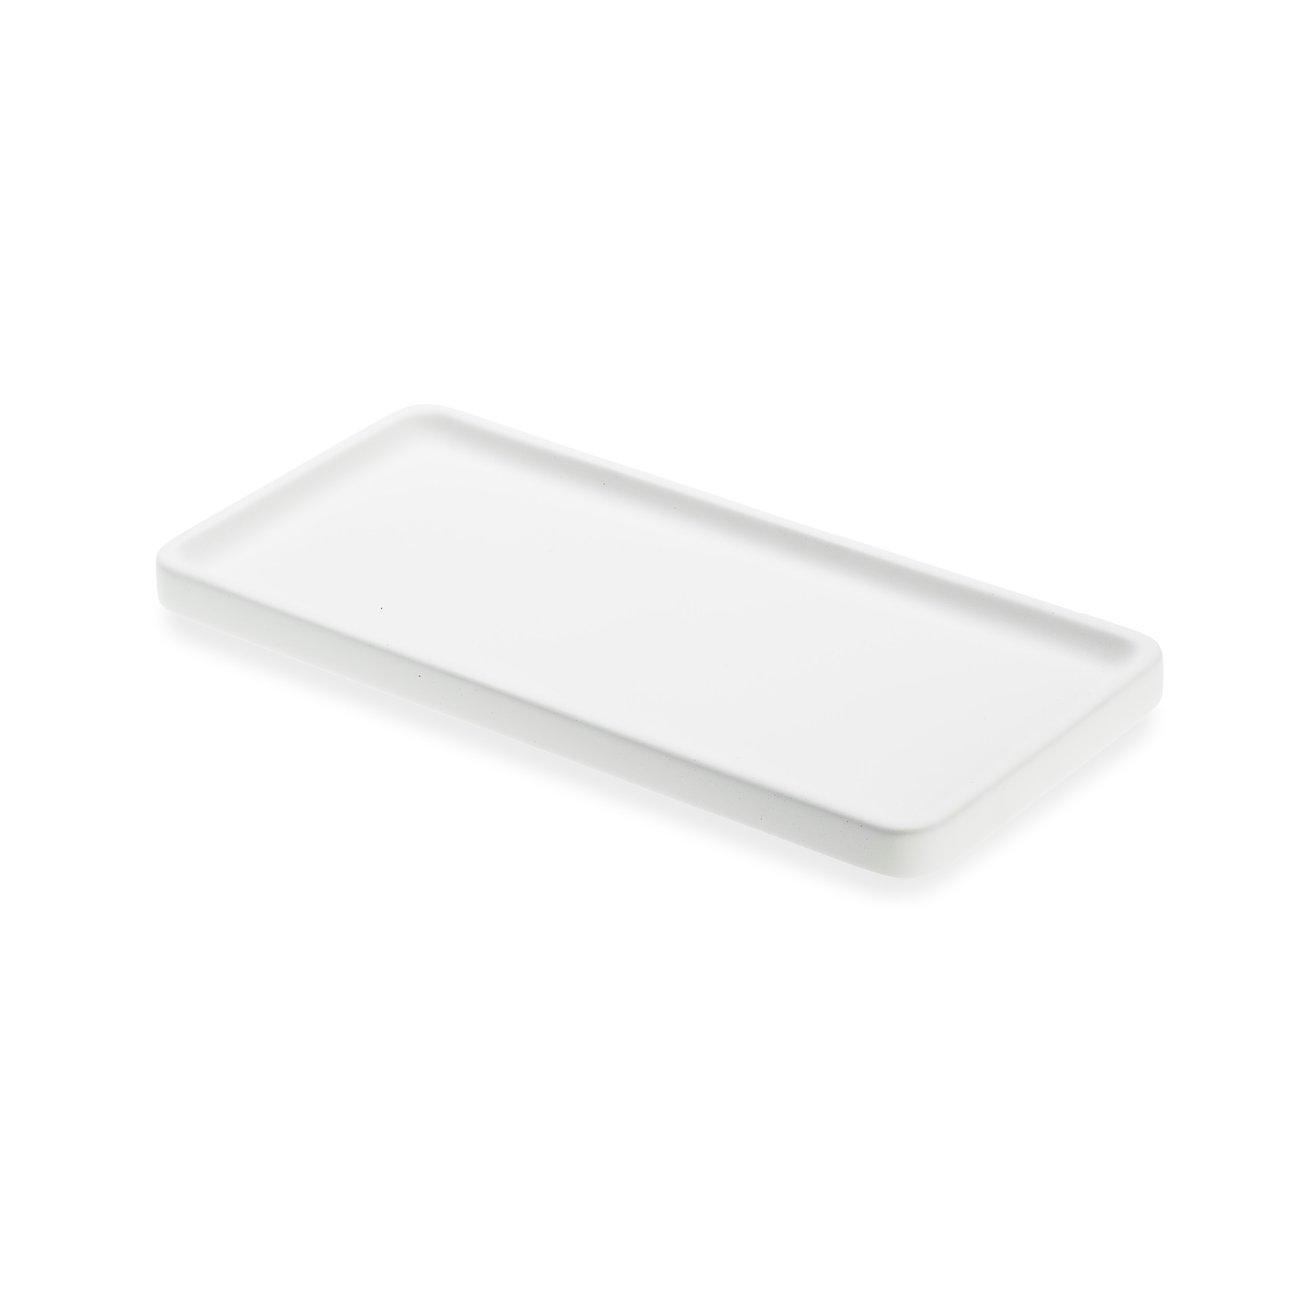 LIKEconcrete - Karin Tray X Small 20 x 10 x 2 cm - White (93760)